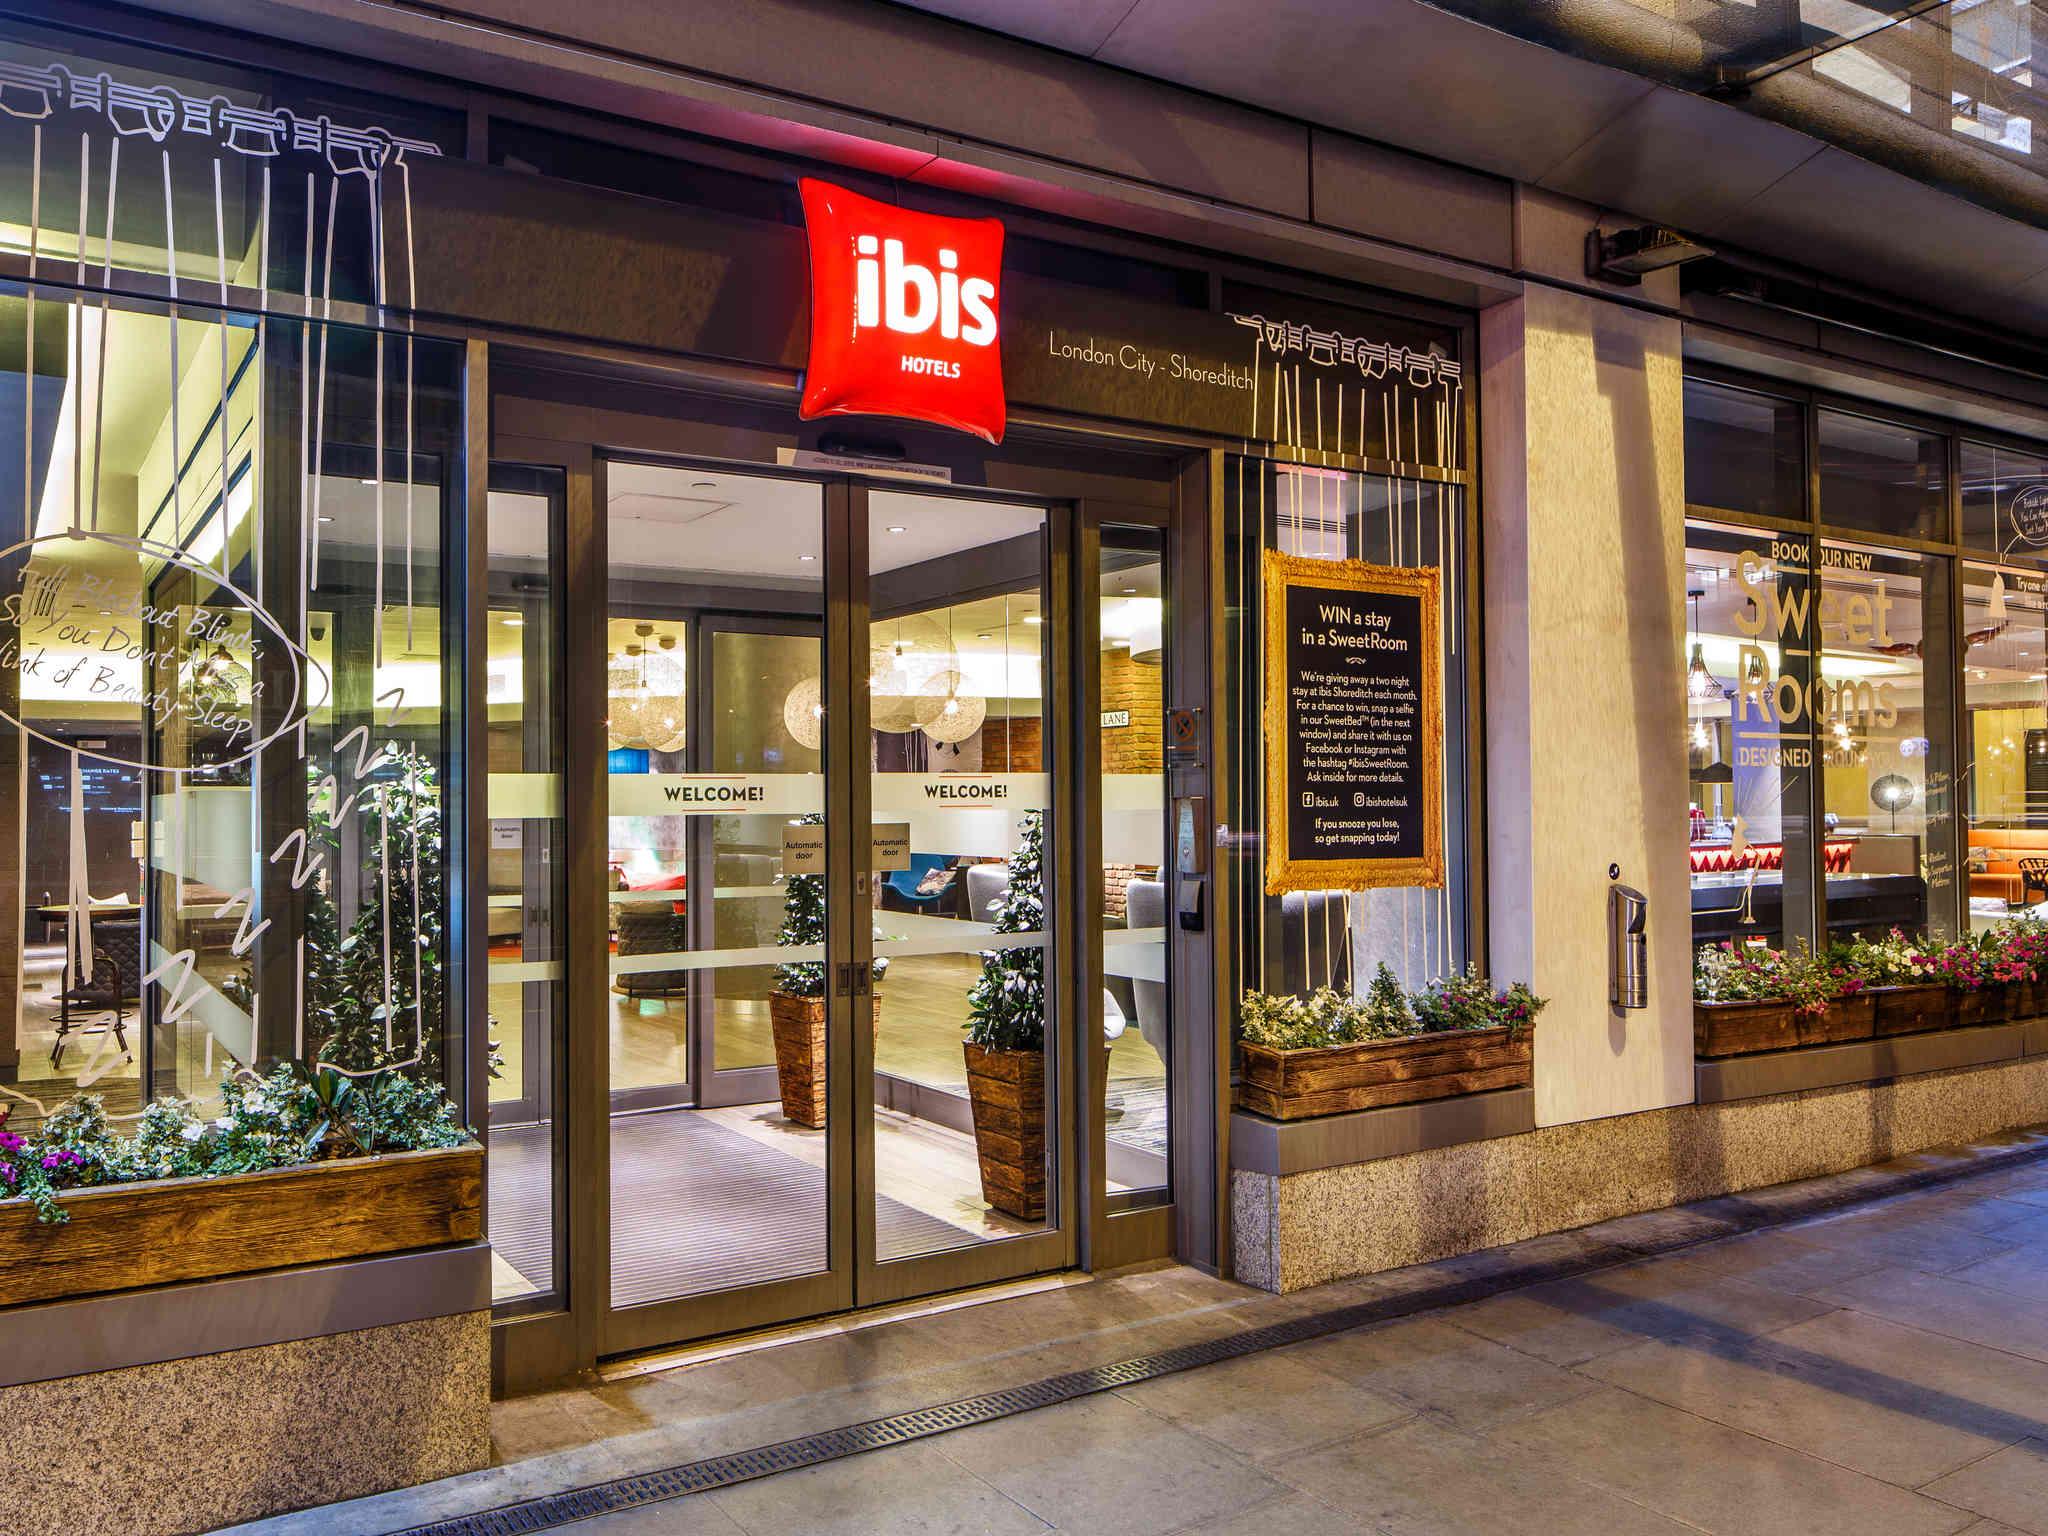 Hotel – ibis London City - Shoreditch